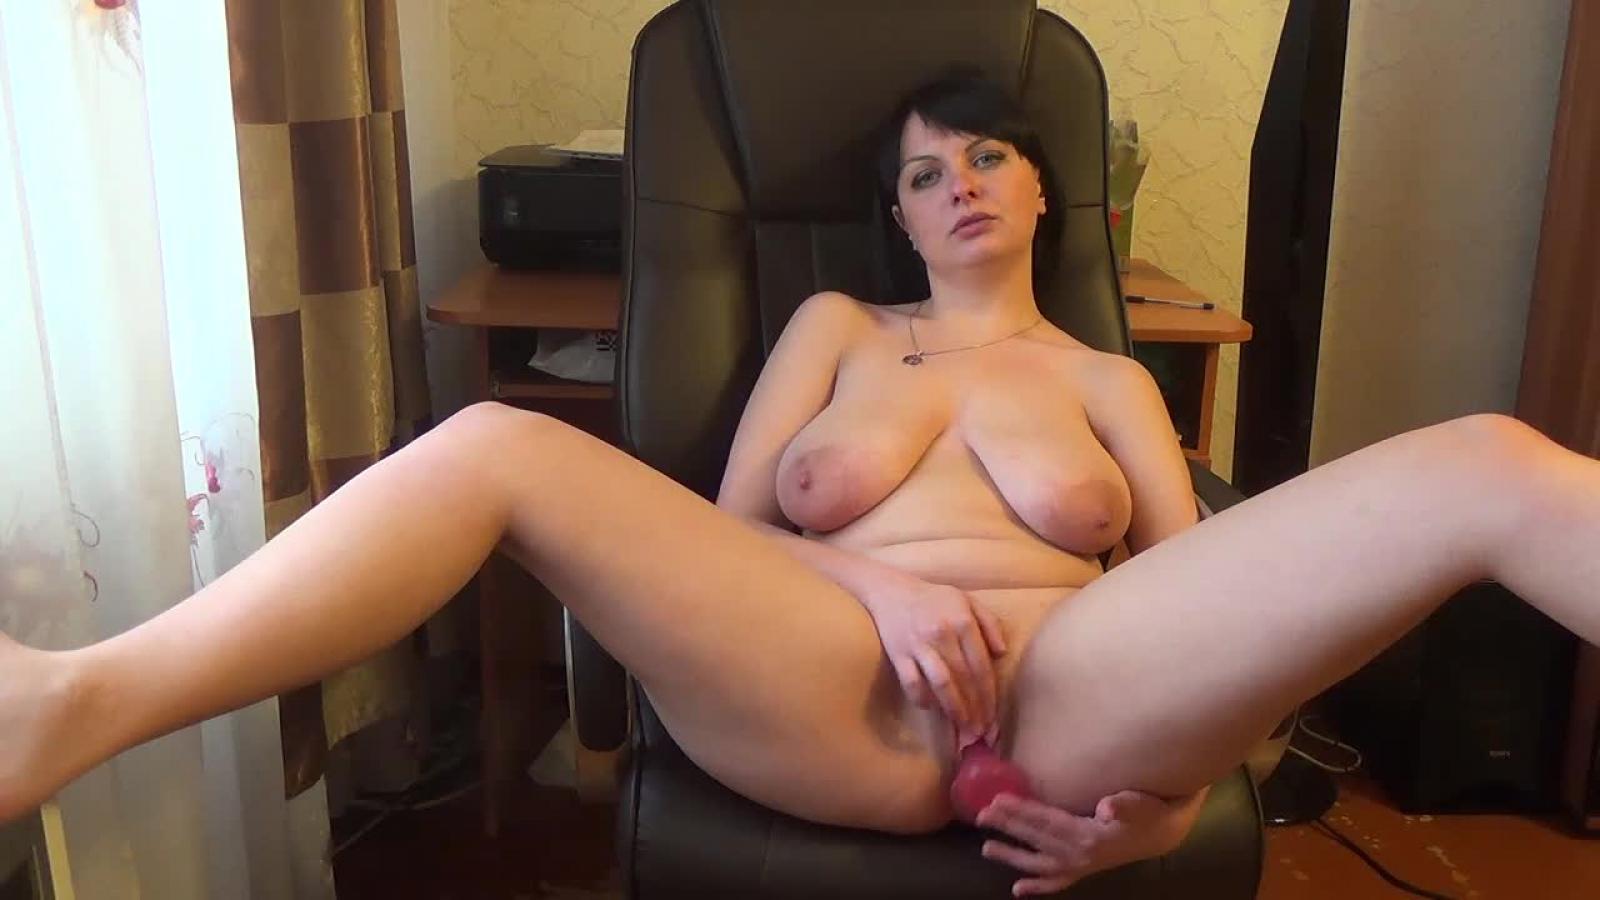 veb-kamera-video-porno-smotret-porno-video-seks-vo-vremya-massazha